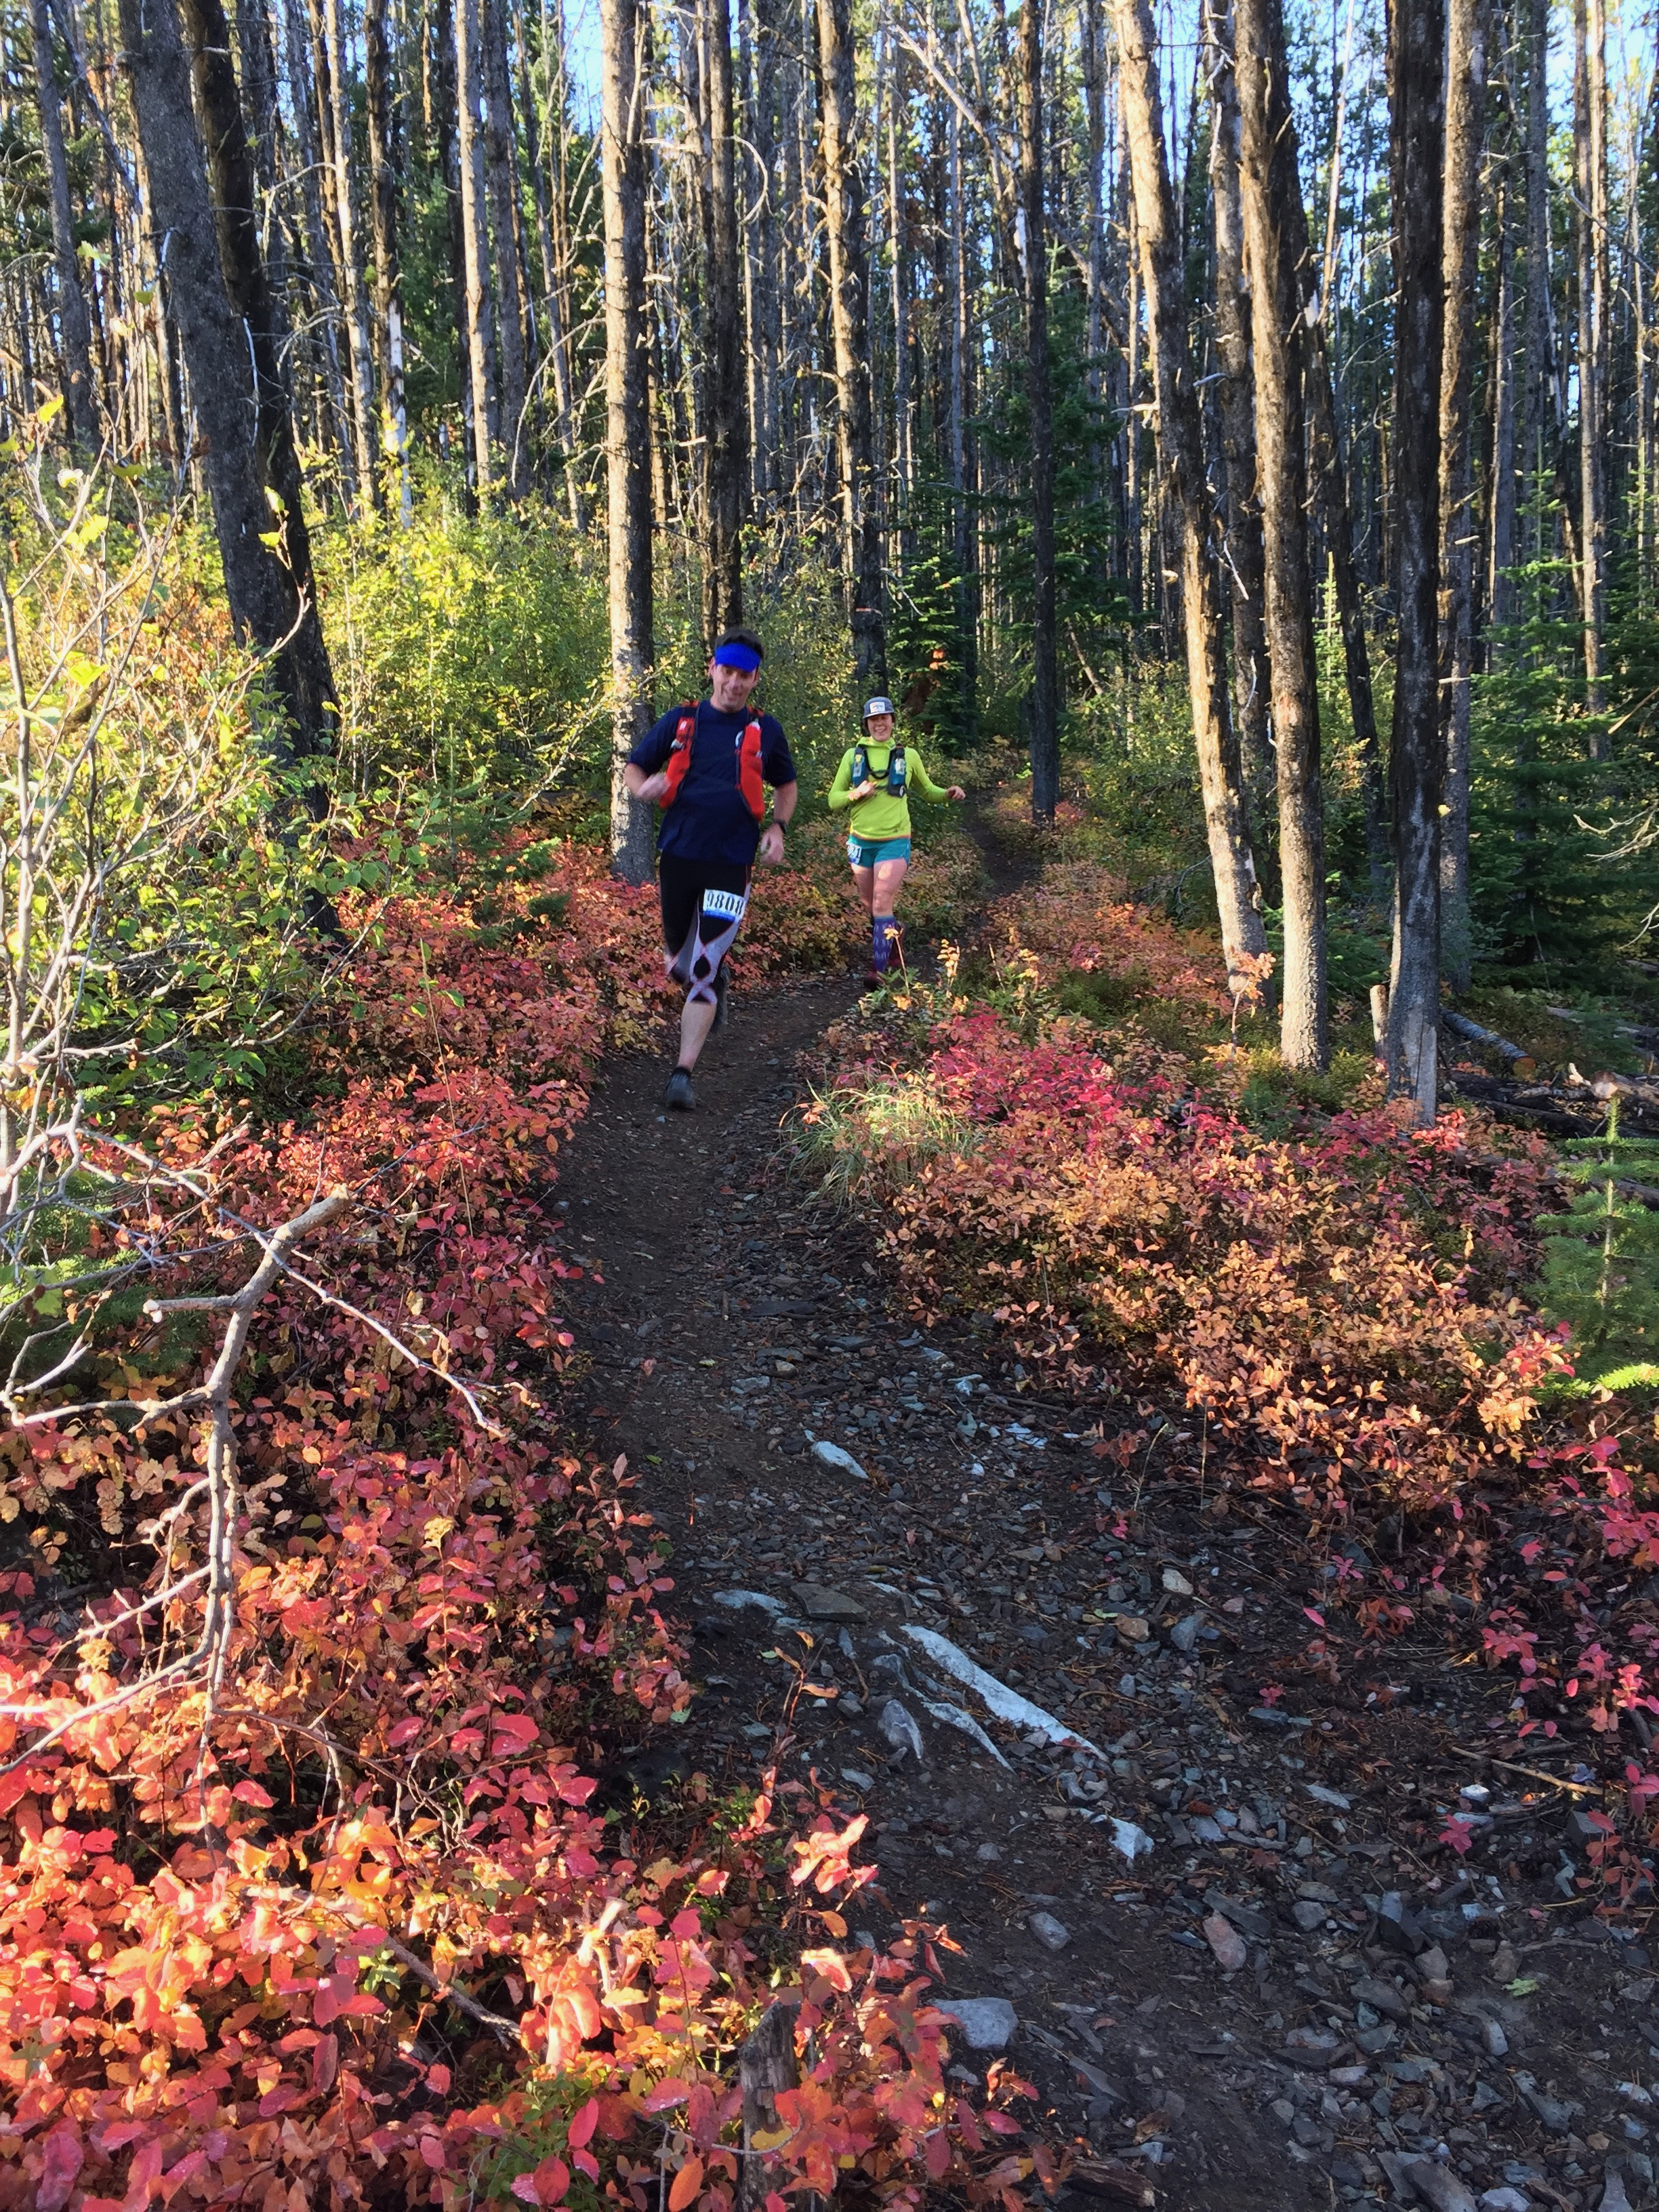 foys to blacktail trails trail marathon ftbtIMG_1043.JPG